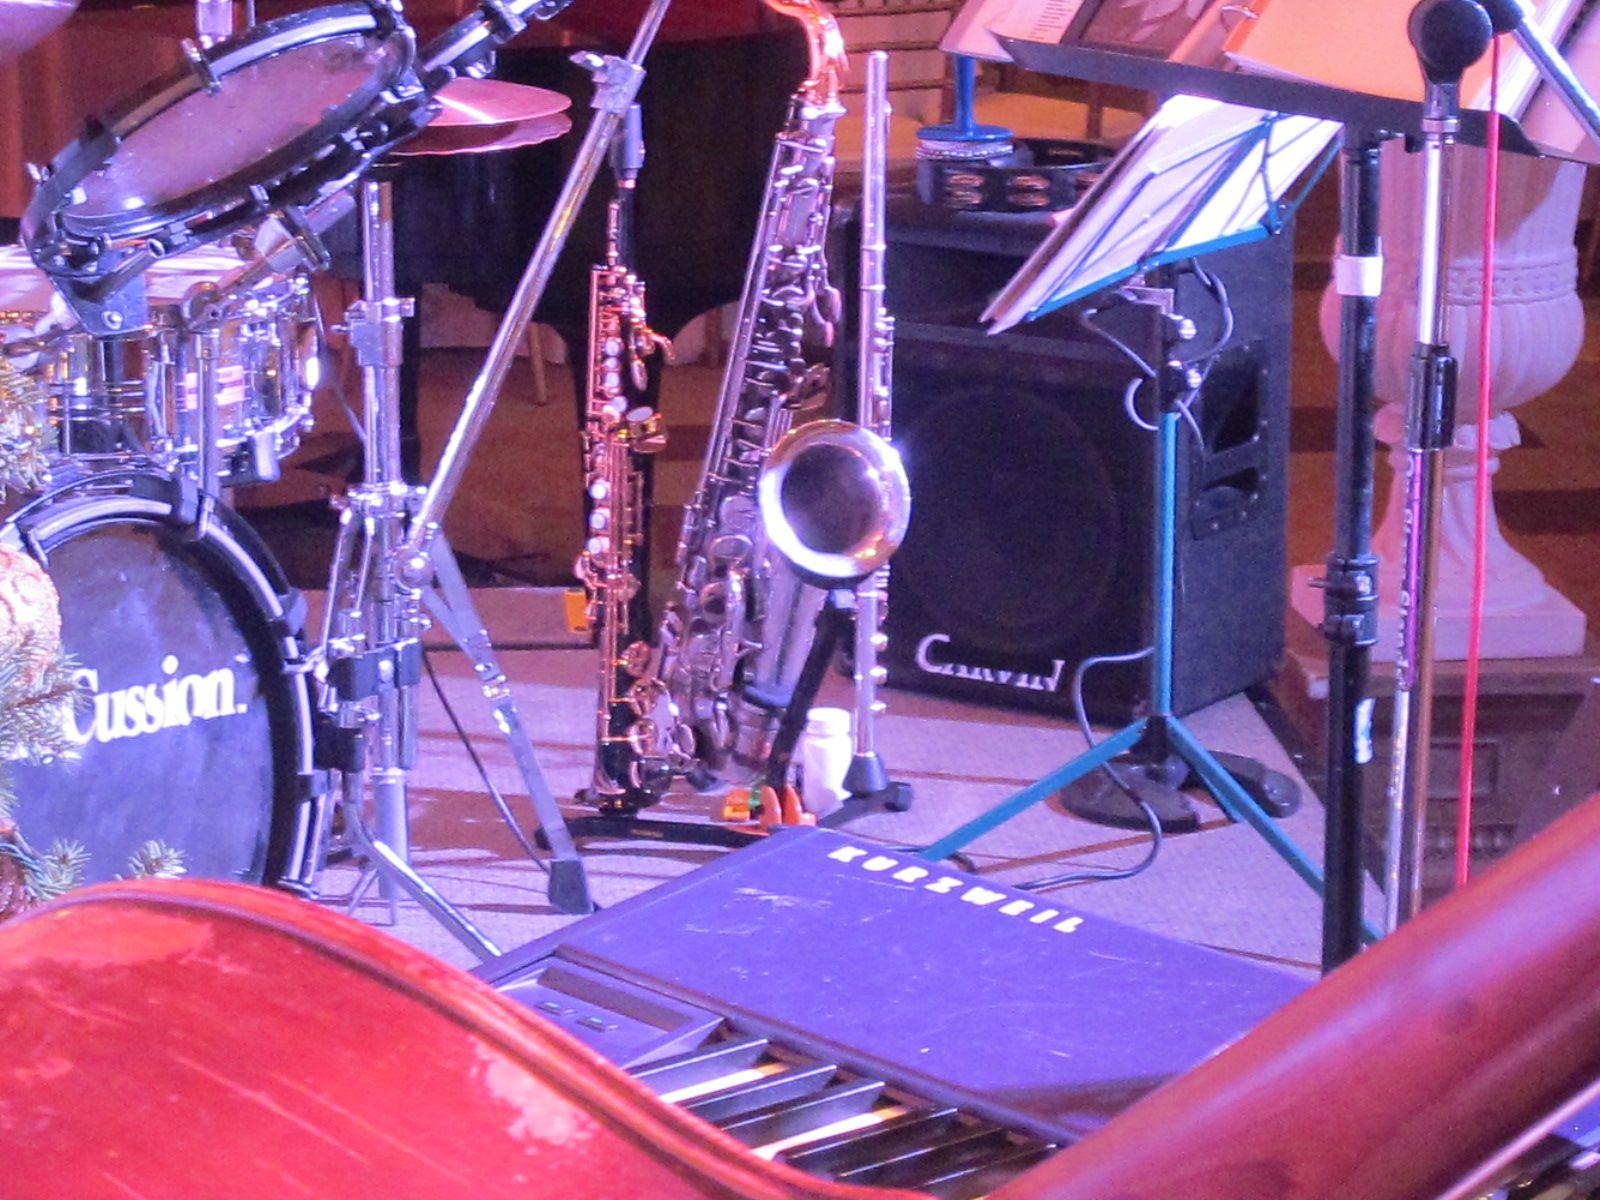 Jazz Trio with Sax and Vocalist